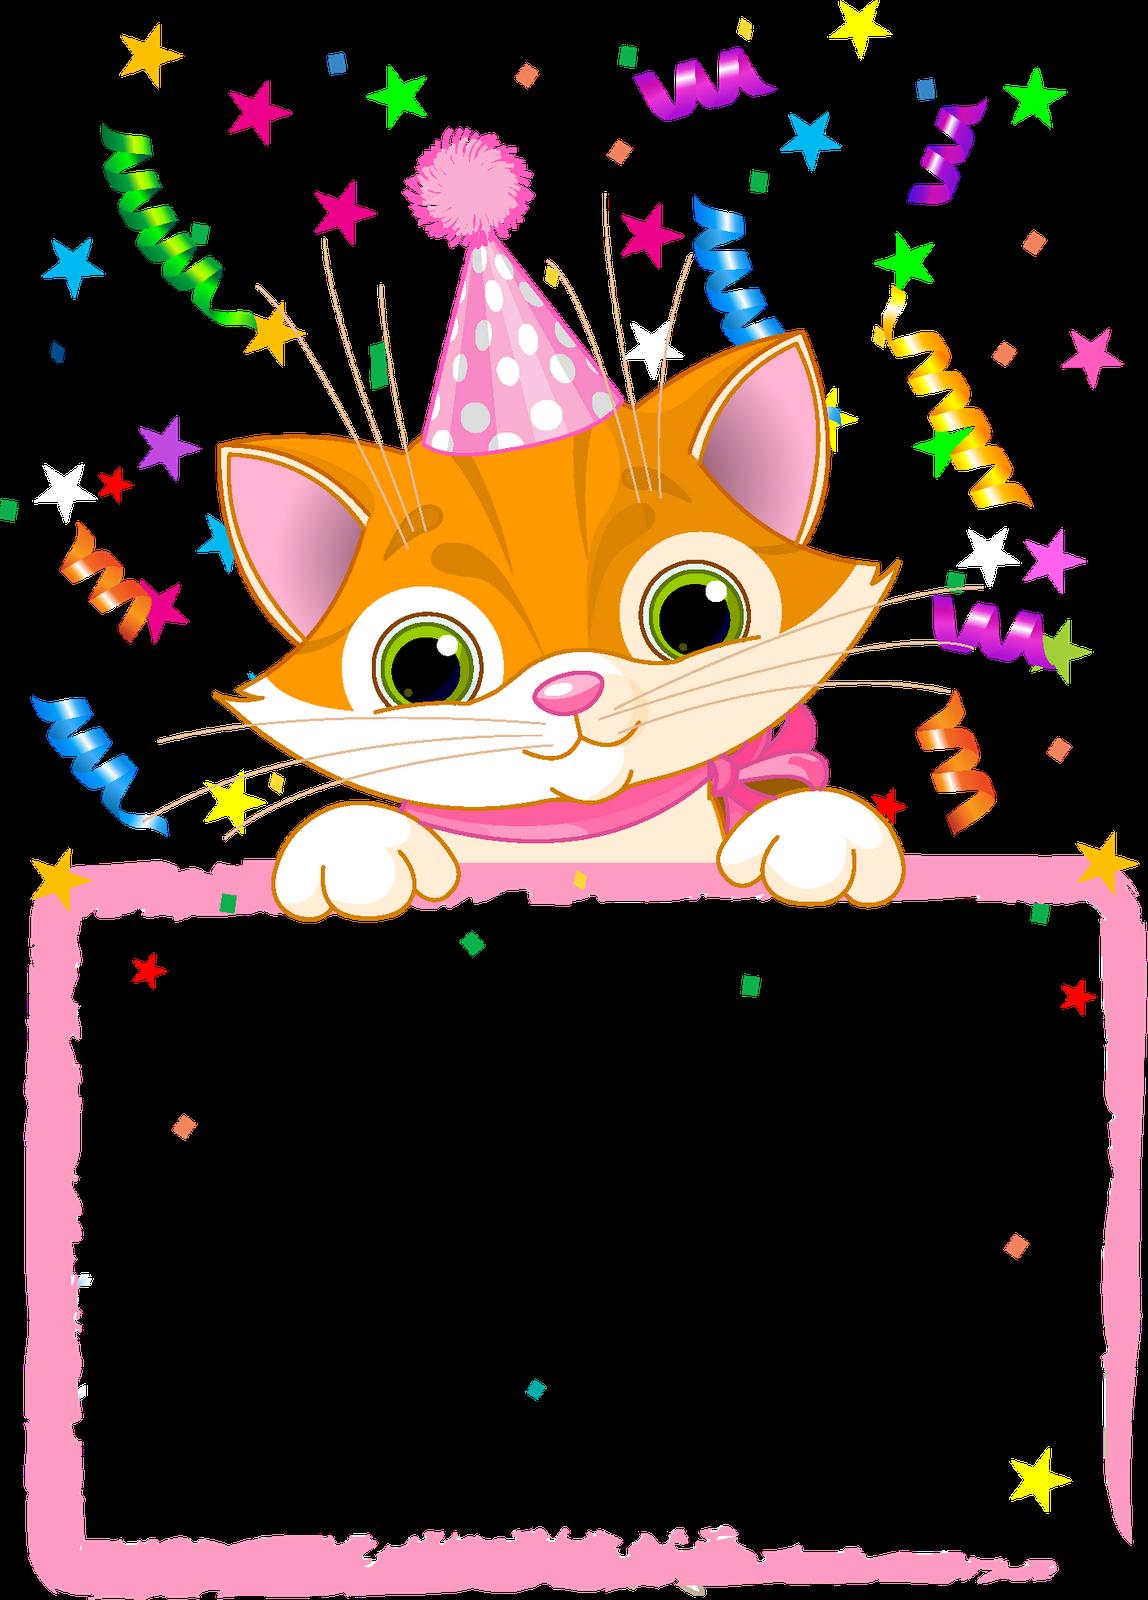 Png marcos gratis para. Kindergarten clipart birthday